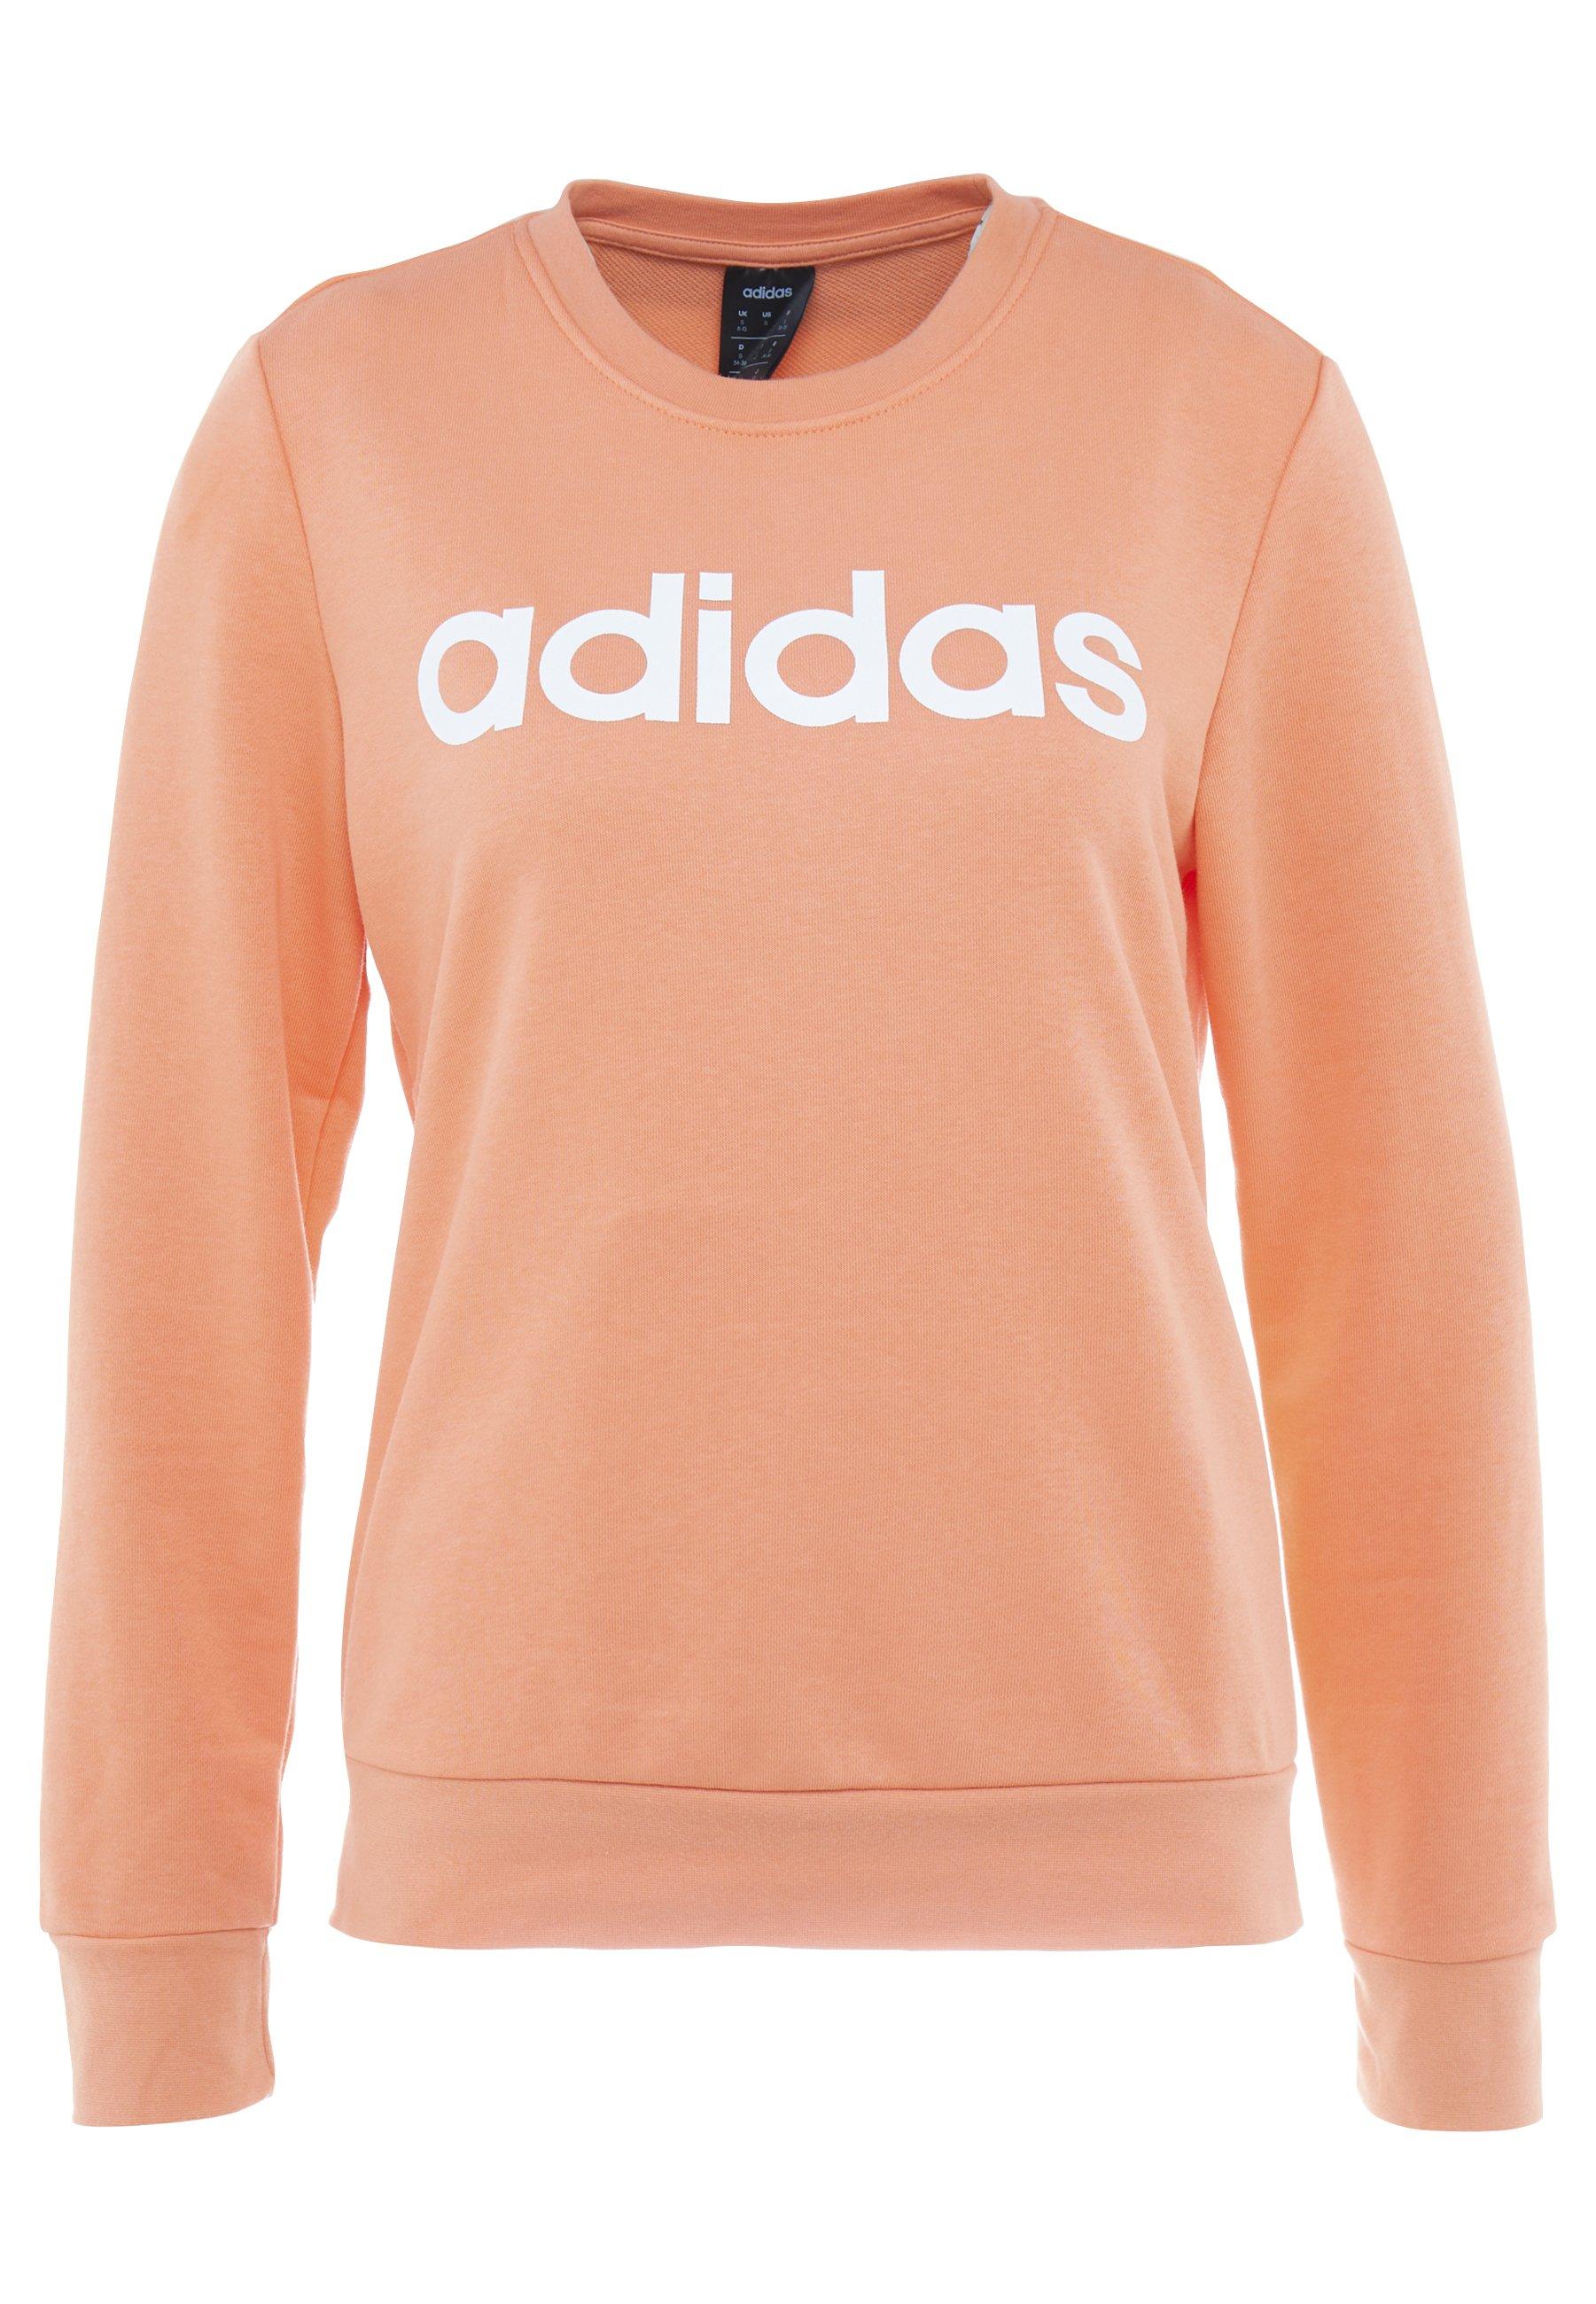 adidas Performance Sweatshirt pinkwhite Zalando.at